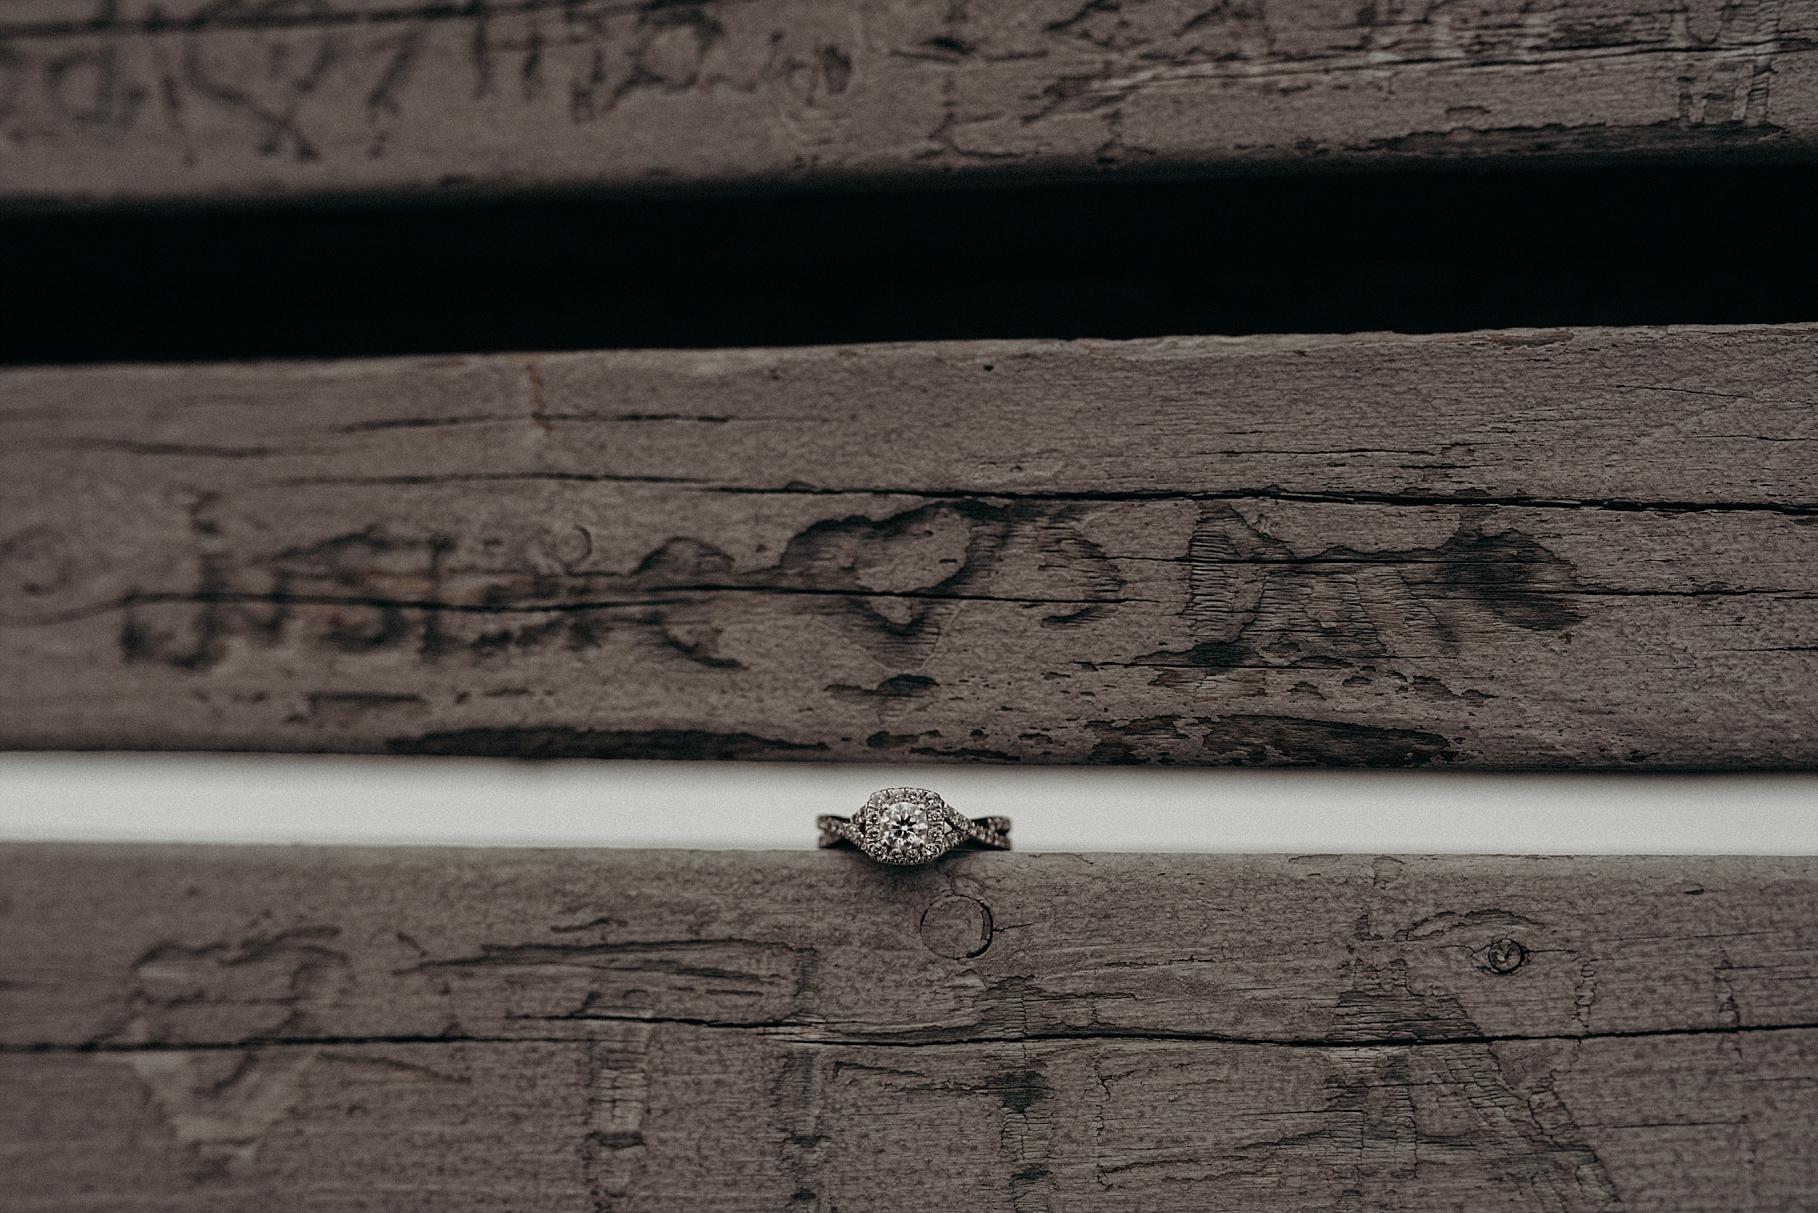 Mocha Tree Studios Ottawa Toronto Montreal Wedding and Engagement Photographer and Videographer Dark Moody Intimate Authentic Modern Romantic Cinematic Best Candid Nepean Sailing Club Andew Haydon Park 5